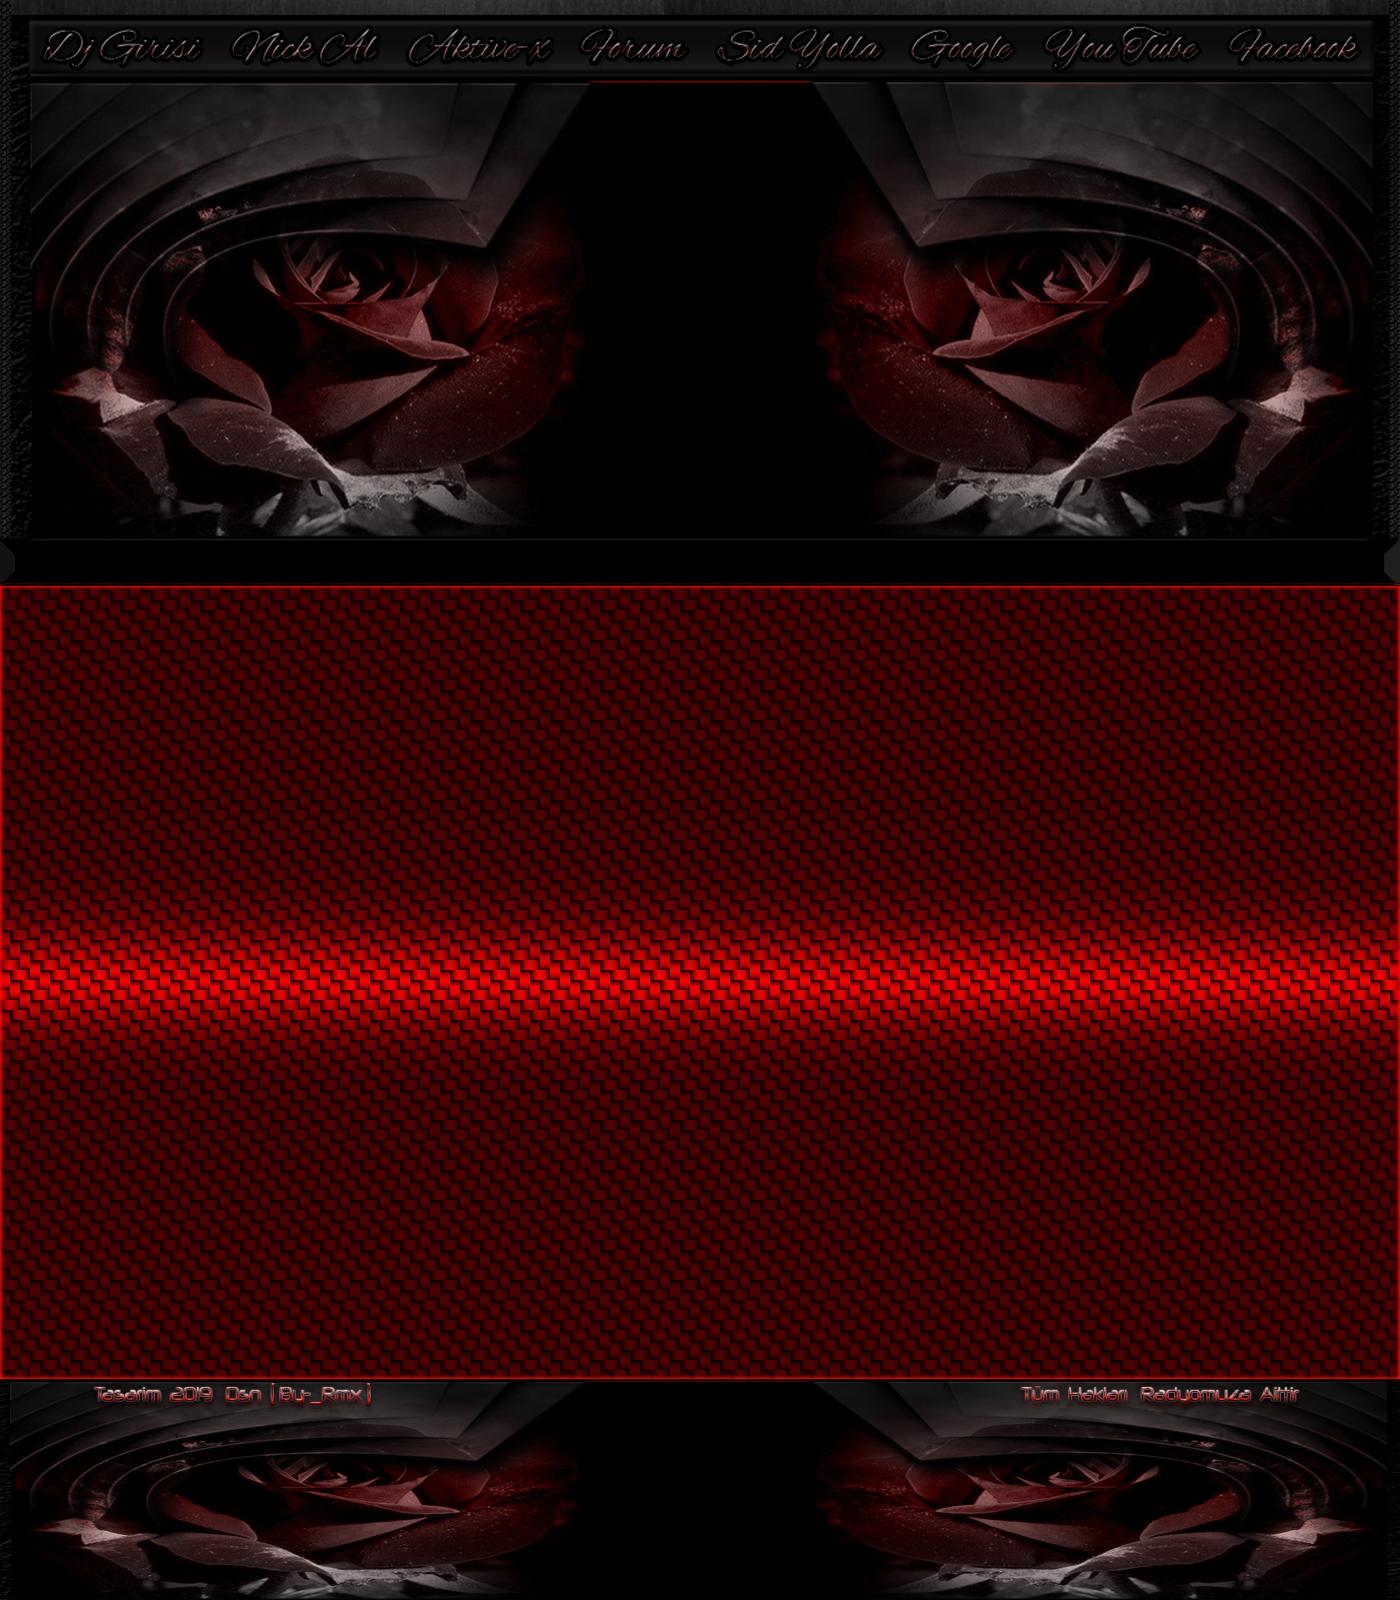 Gri Kırmızı Kırmızı Güllü İndexx 2020